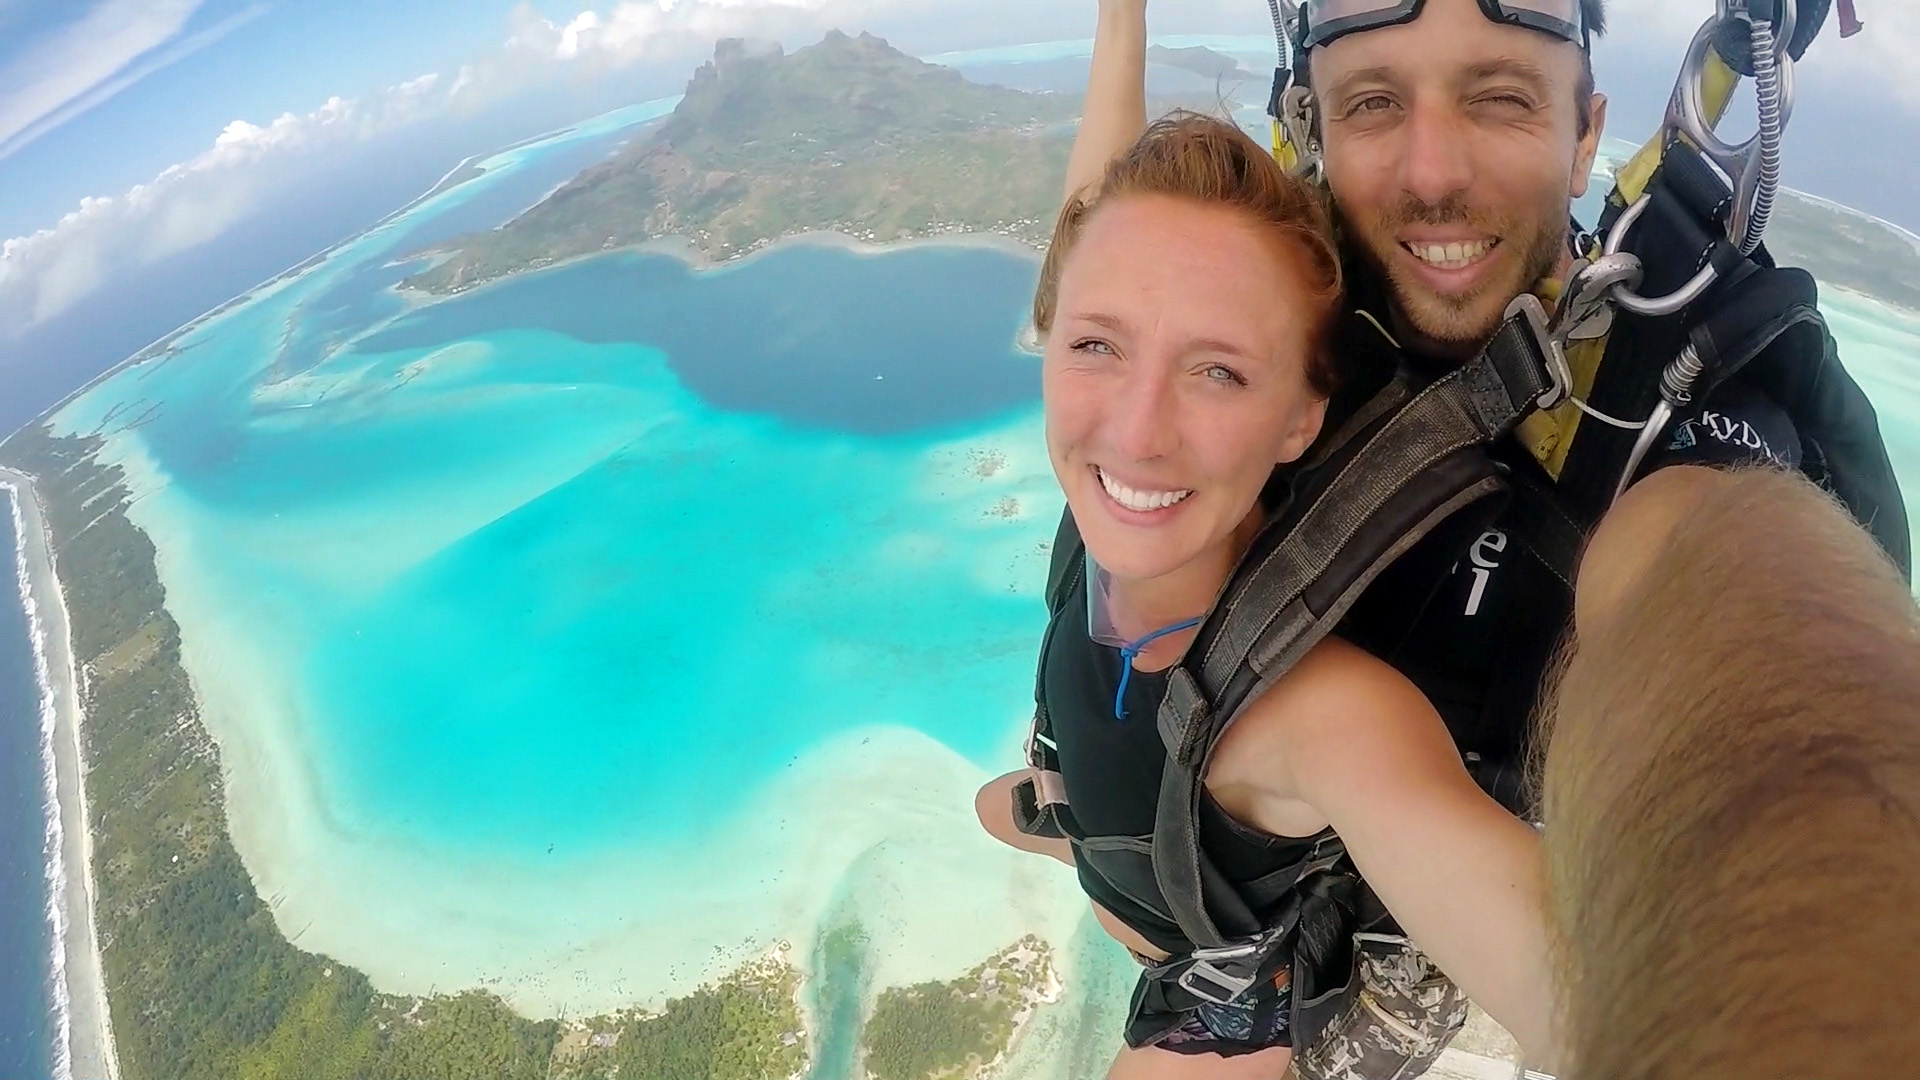 Kaytee Skydiving in Bora Bora 20160.jpg